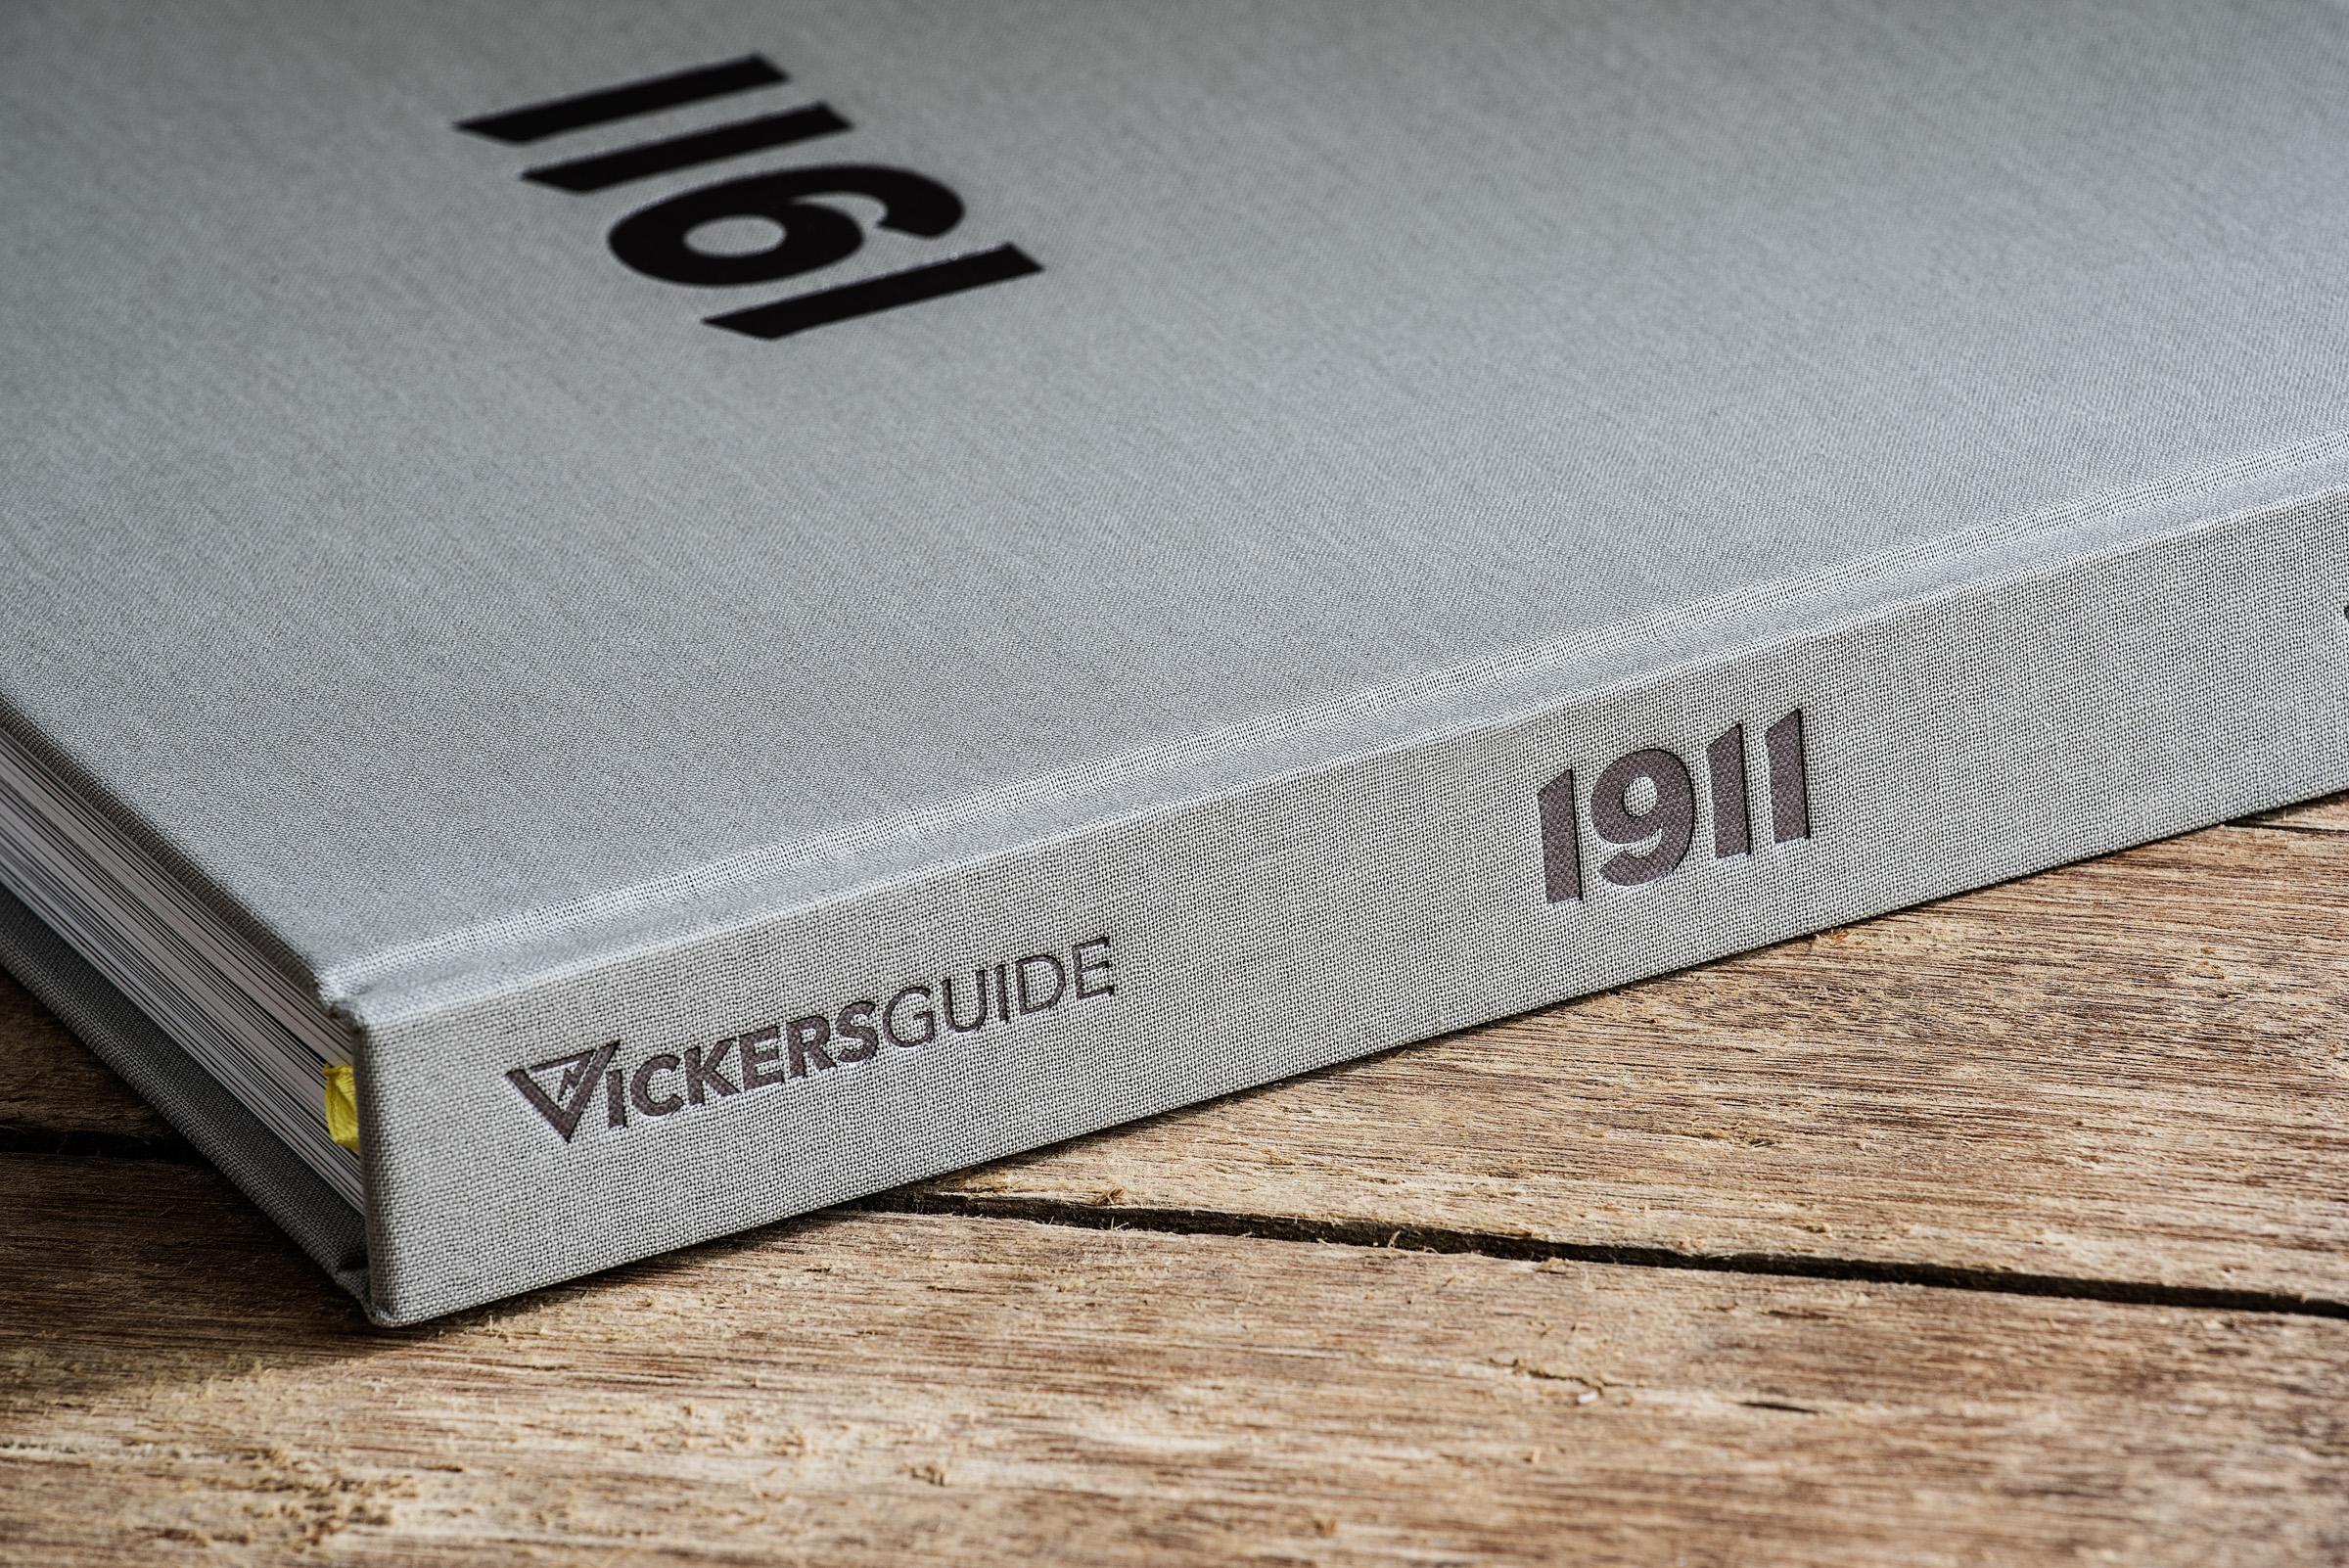 Book_1911-00005-Edit-Edit.jpg